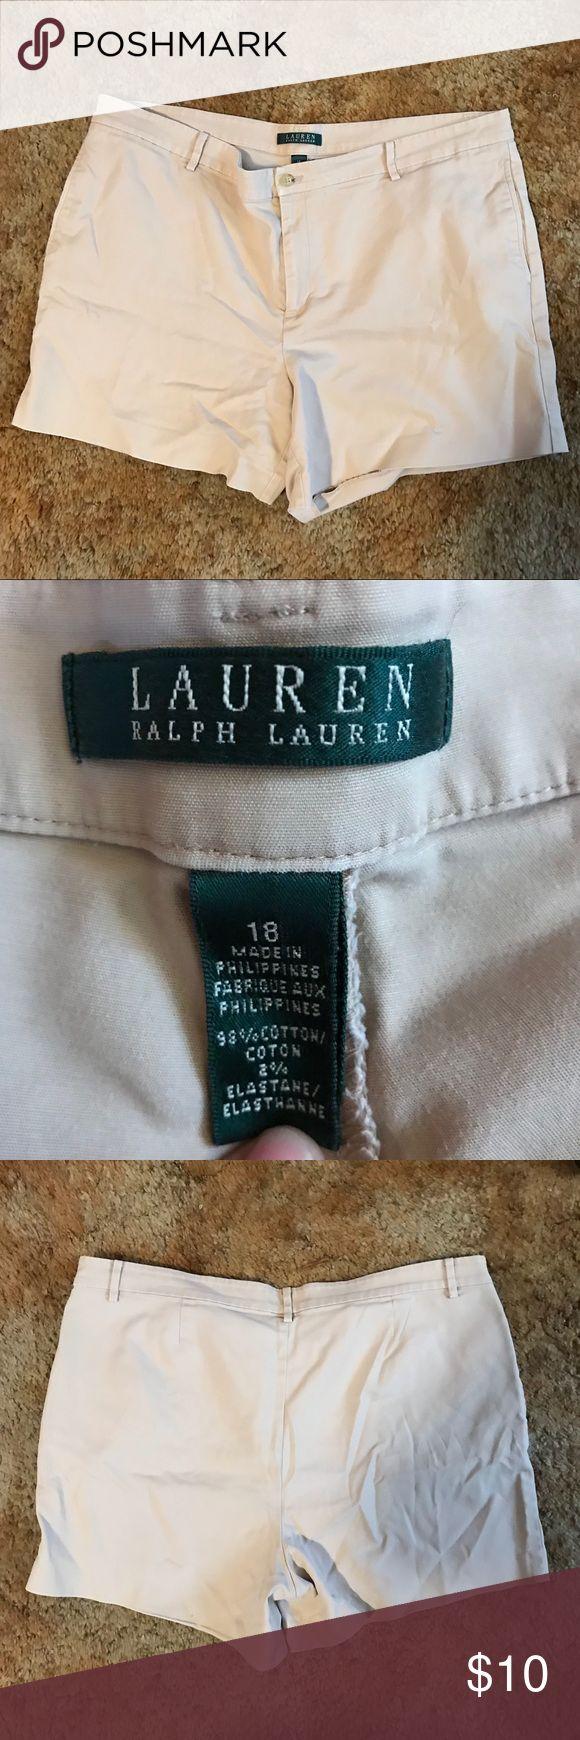 Ralph Lauren Tan Shorts Ralph Lauren brand Size: 18 Cotton/elastane blend Chino like style Zero flaws  Tags: #ralphlauren #tanshorts Ralph Lauren Shorts